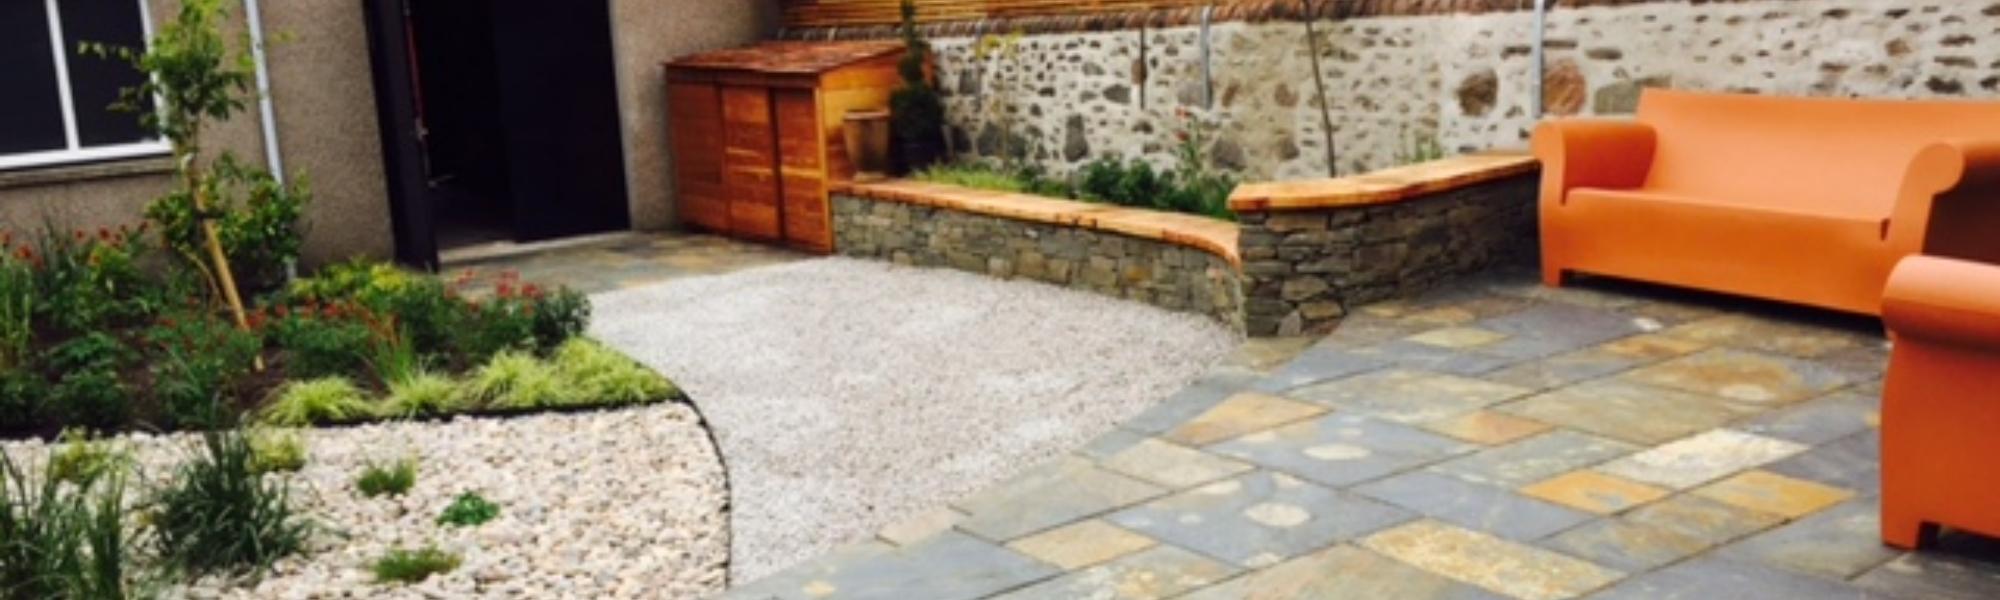 garden design project in Aberdeen